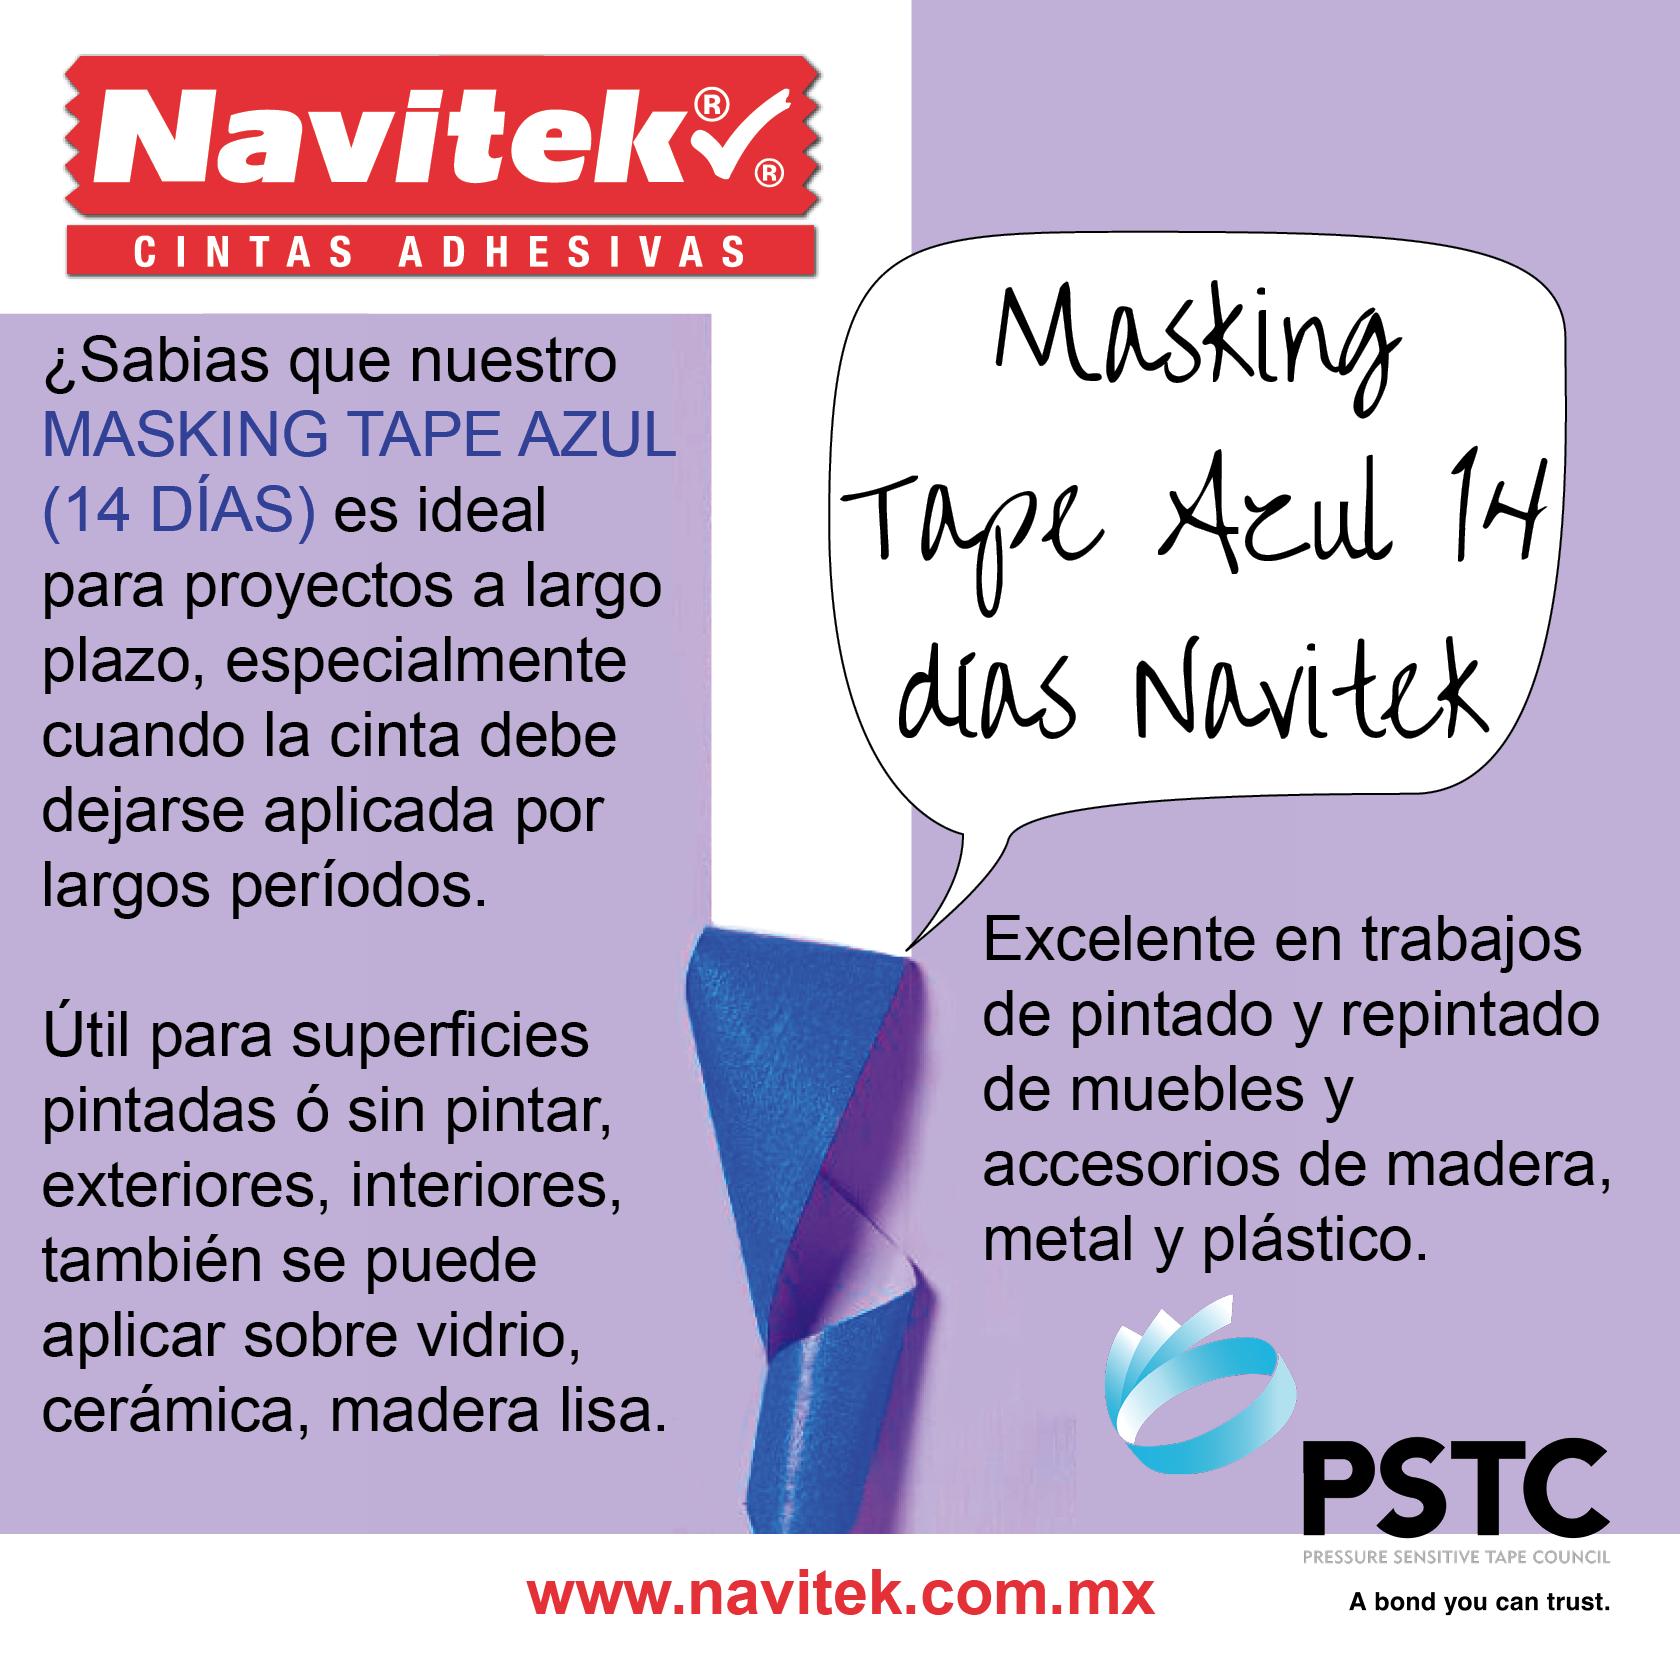 Muebles Navitek - Sab As Que Nuestro Masking Tape Azul Es Ideal Para Proyectos A [mjhdah]https://i.pinimg.com/originals/dd/52/03/dd5203a7fe044b2a89f9a89700d474cb.png